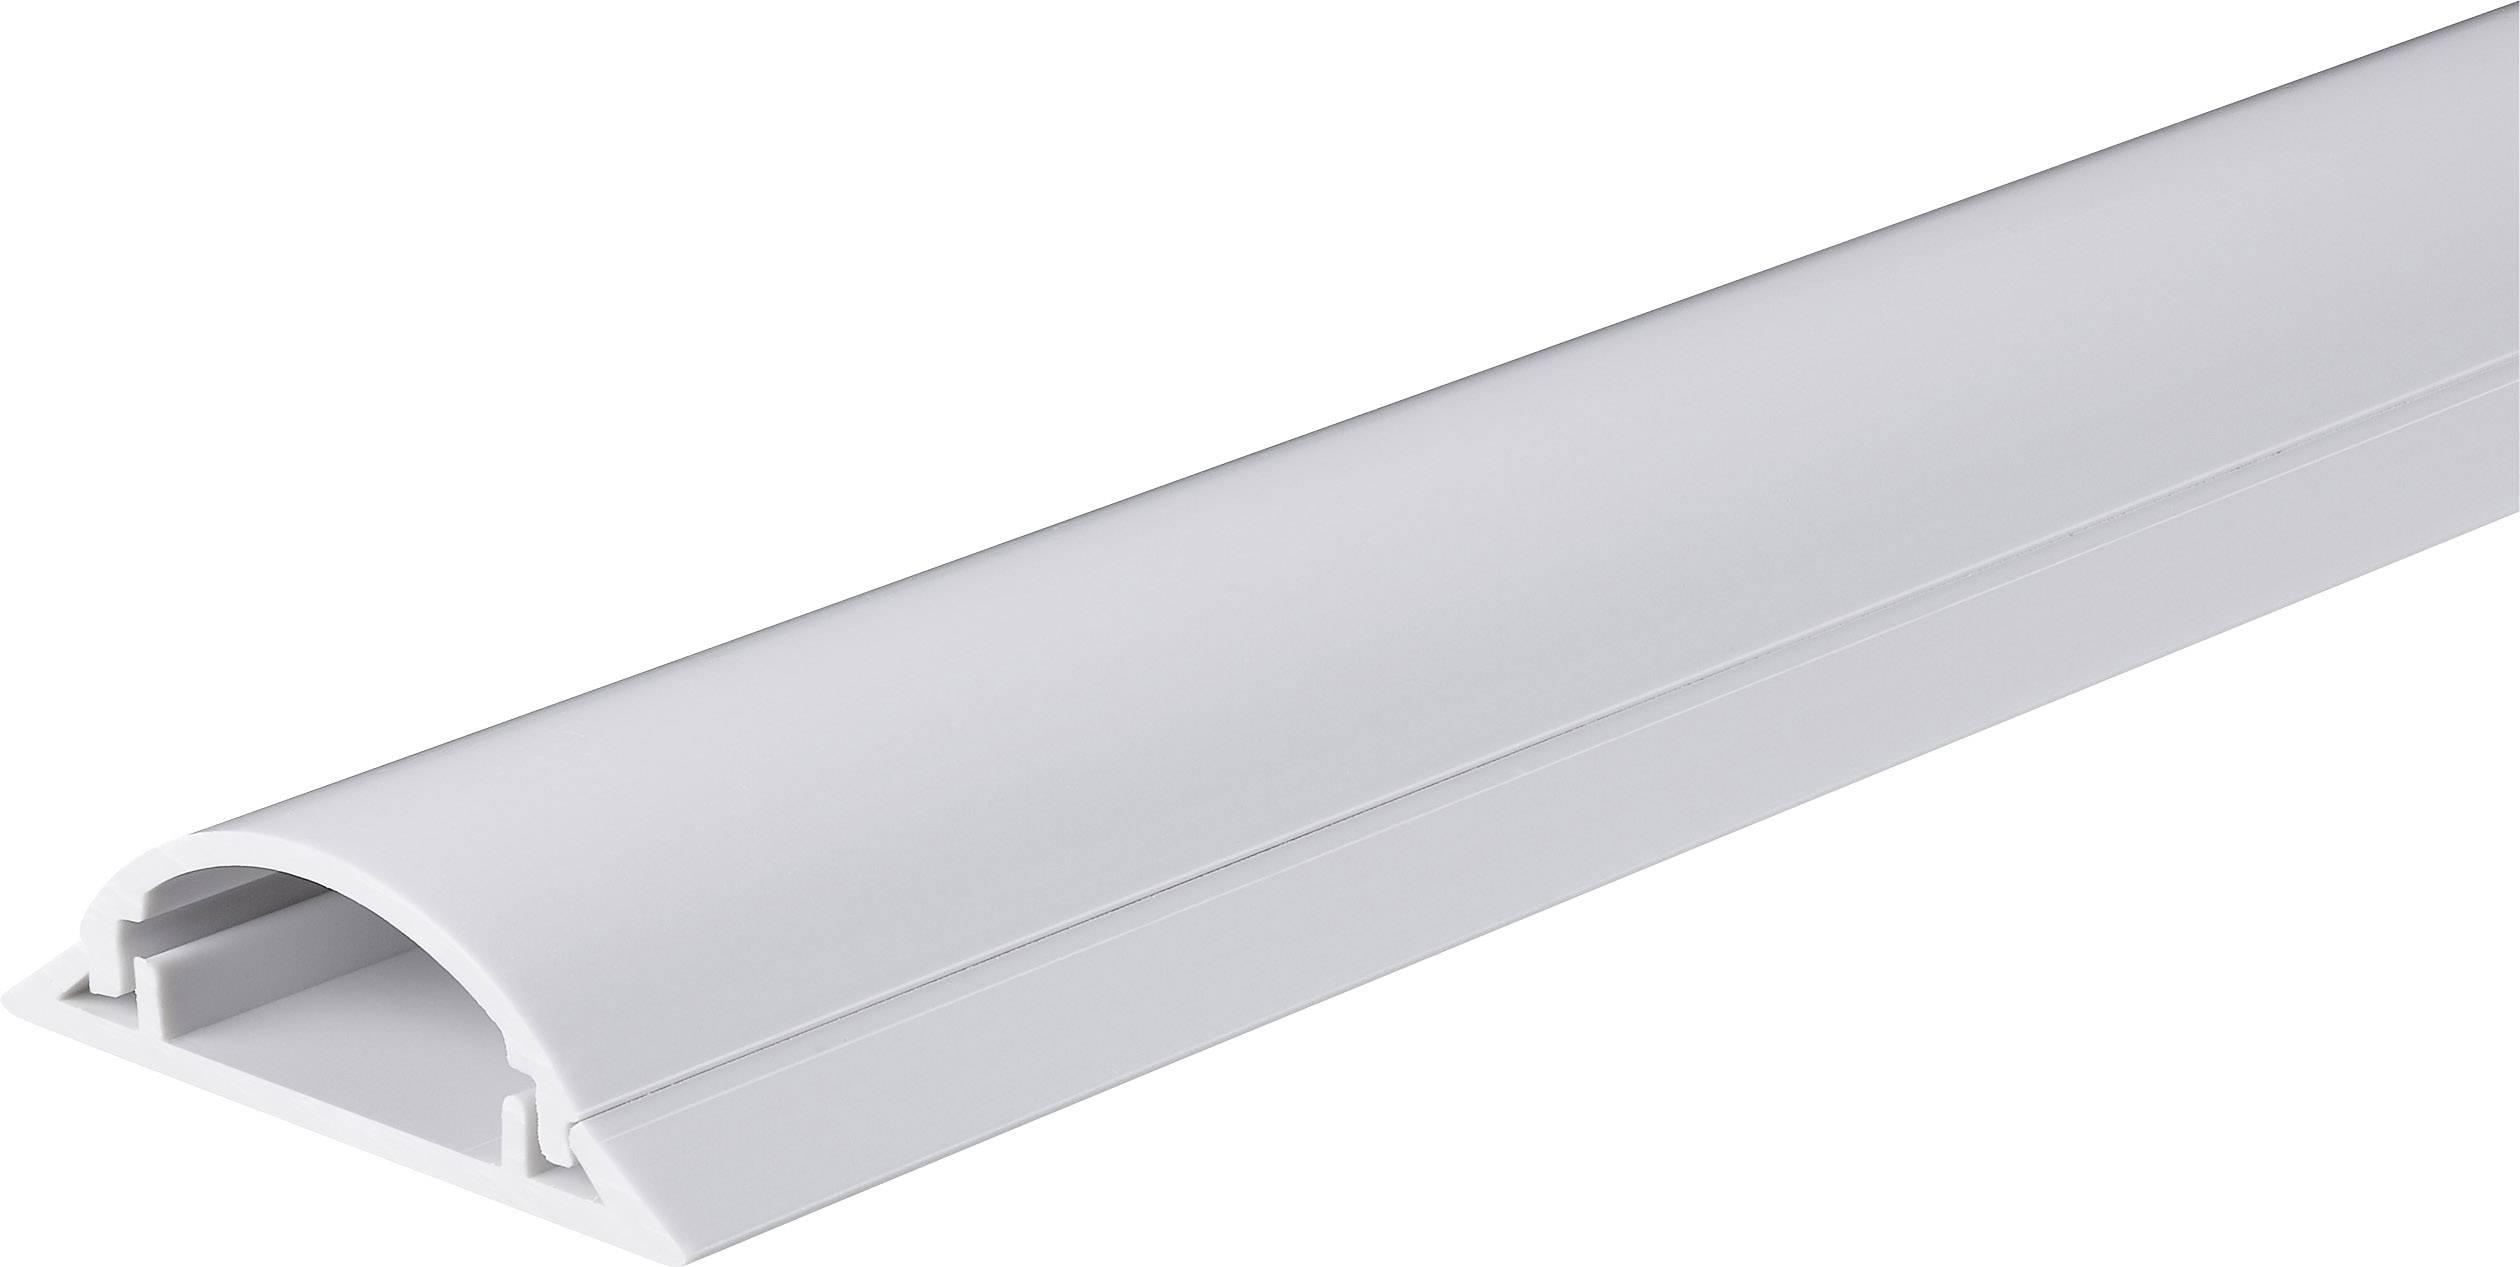 Káblový mostík Conrad Components 1243961 (d x š) 1000 mm x 49.5 mm, biela, 1 ks